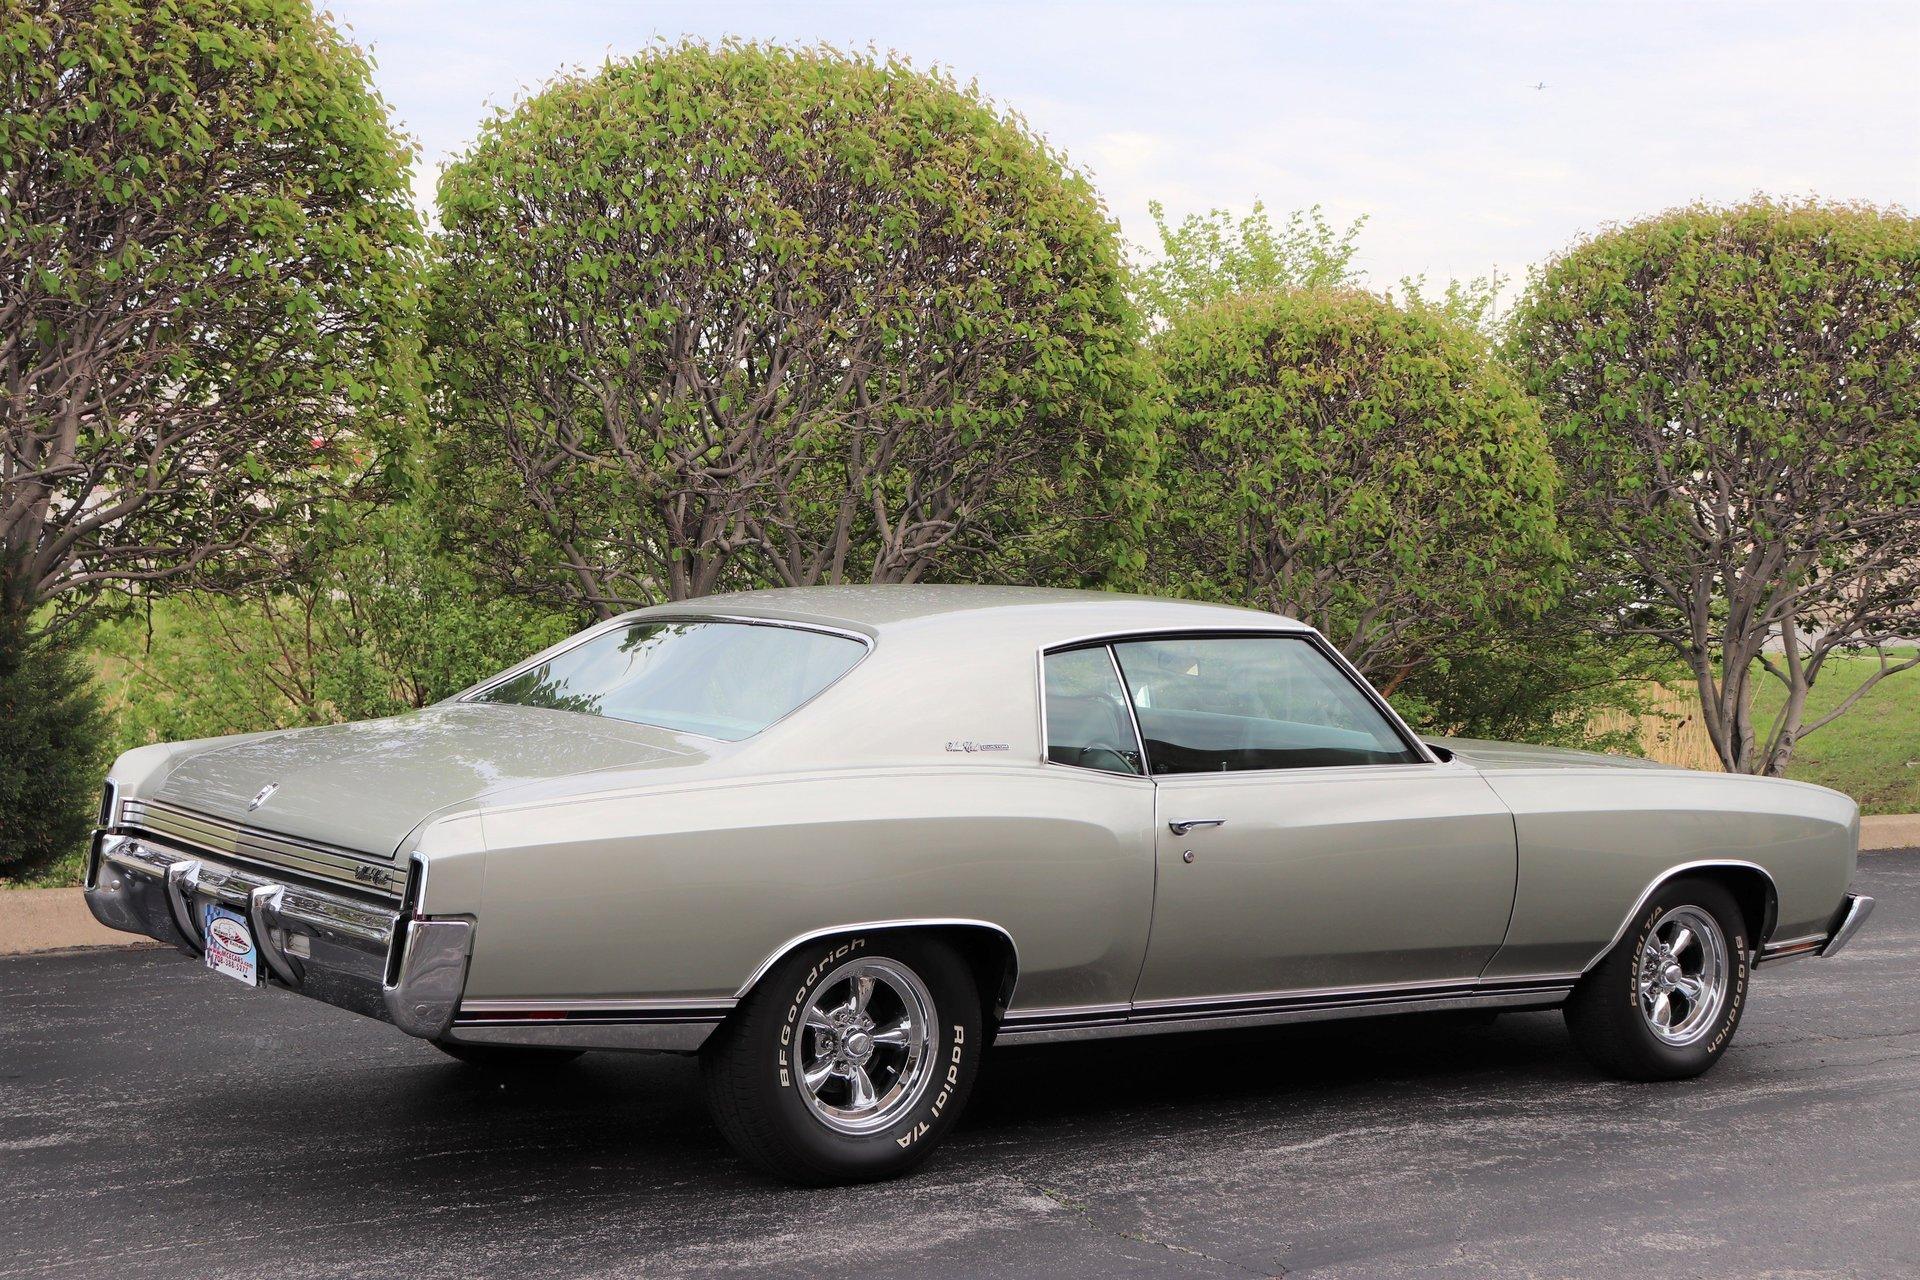 Midwest Car Exchange >> 1972 Chevrolet Monte Carlo Custom for sale #88990 | MCG